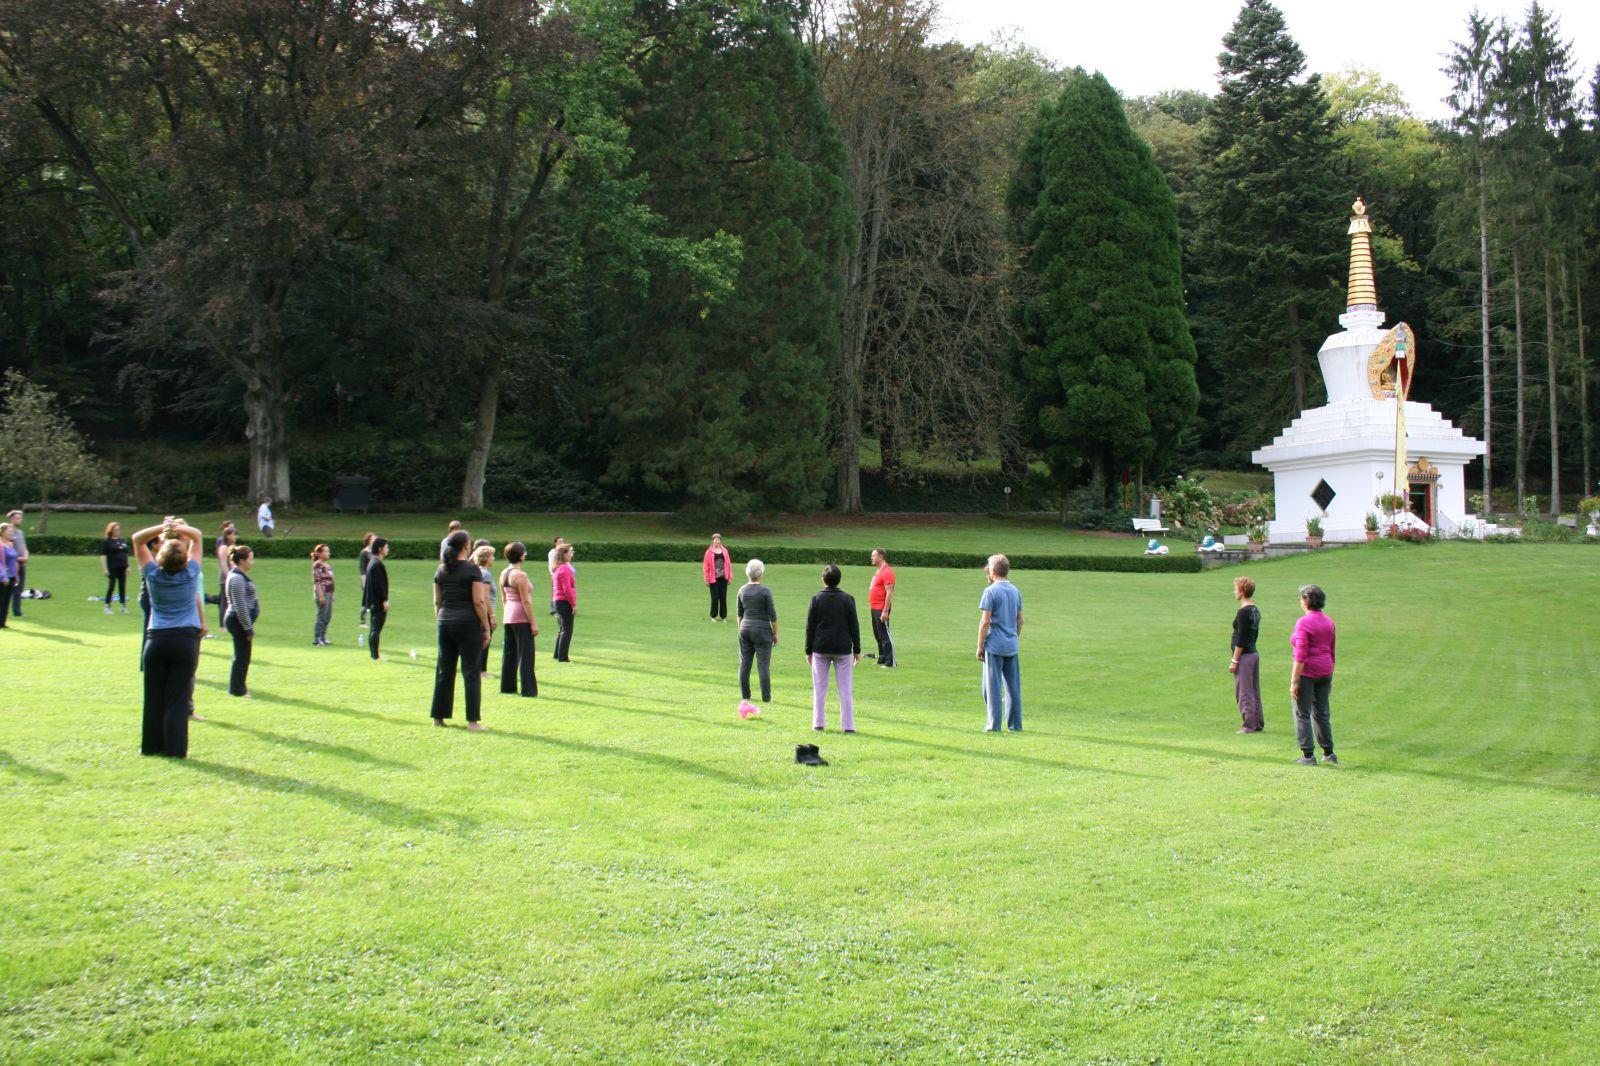 Yoga & Mindfulness retraite september 2014 Huy Belgie